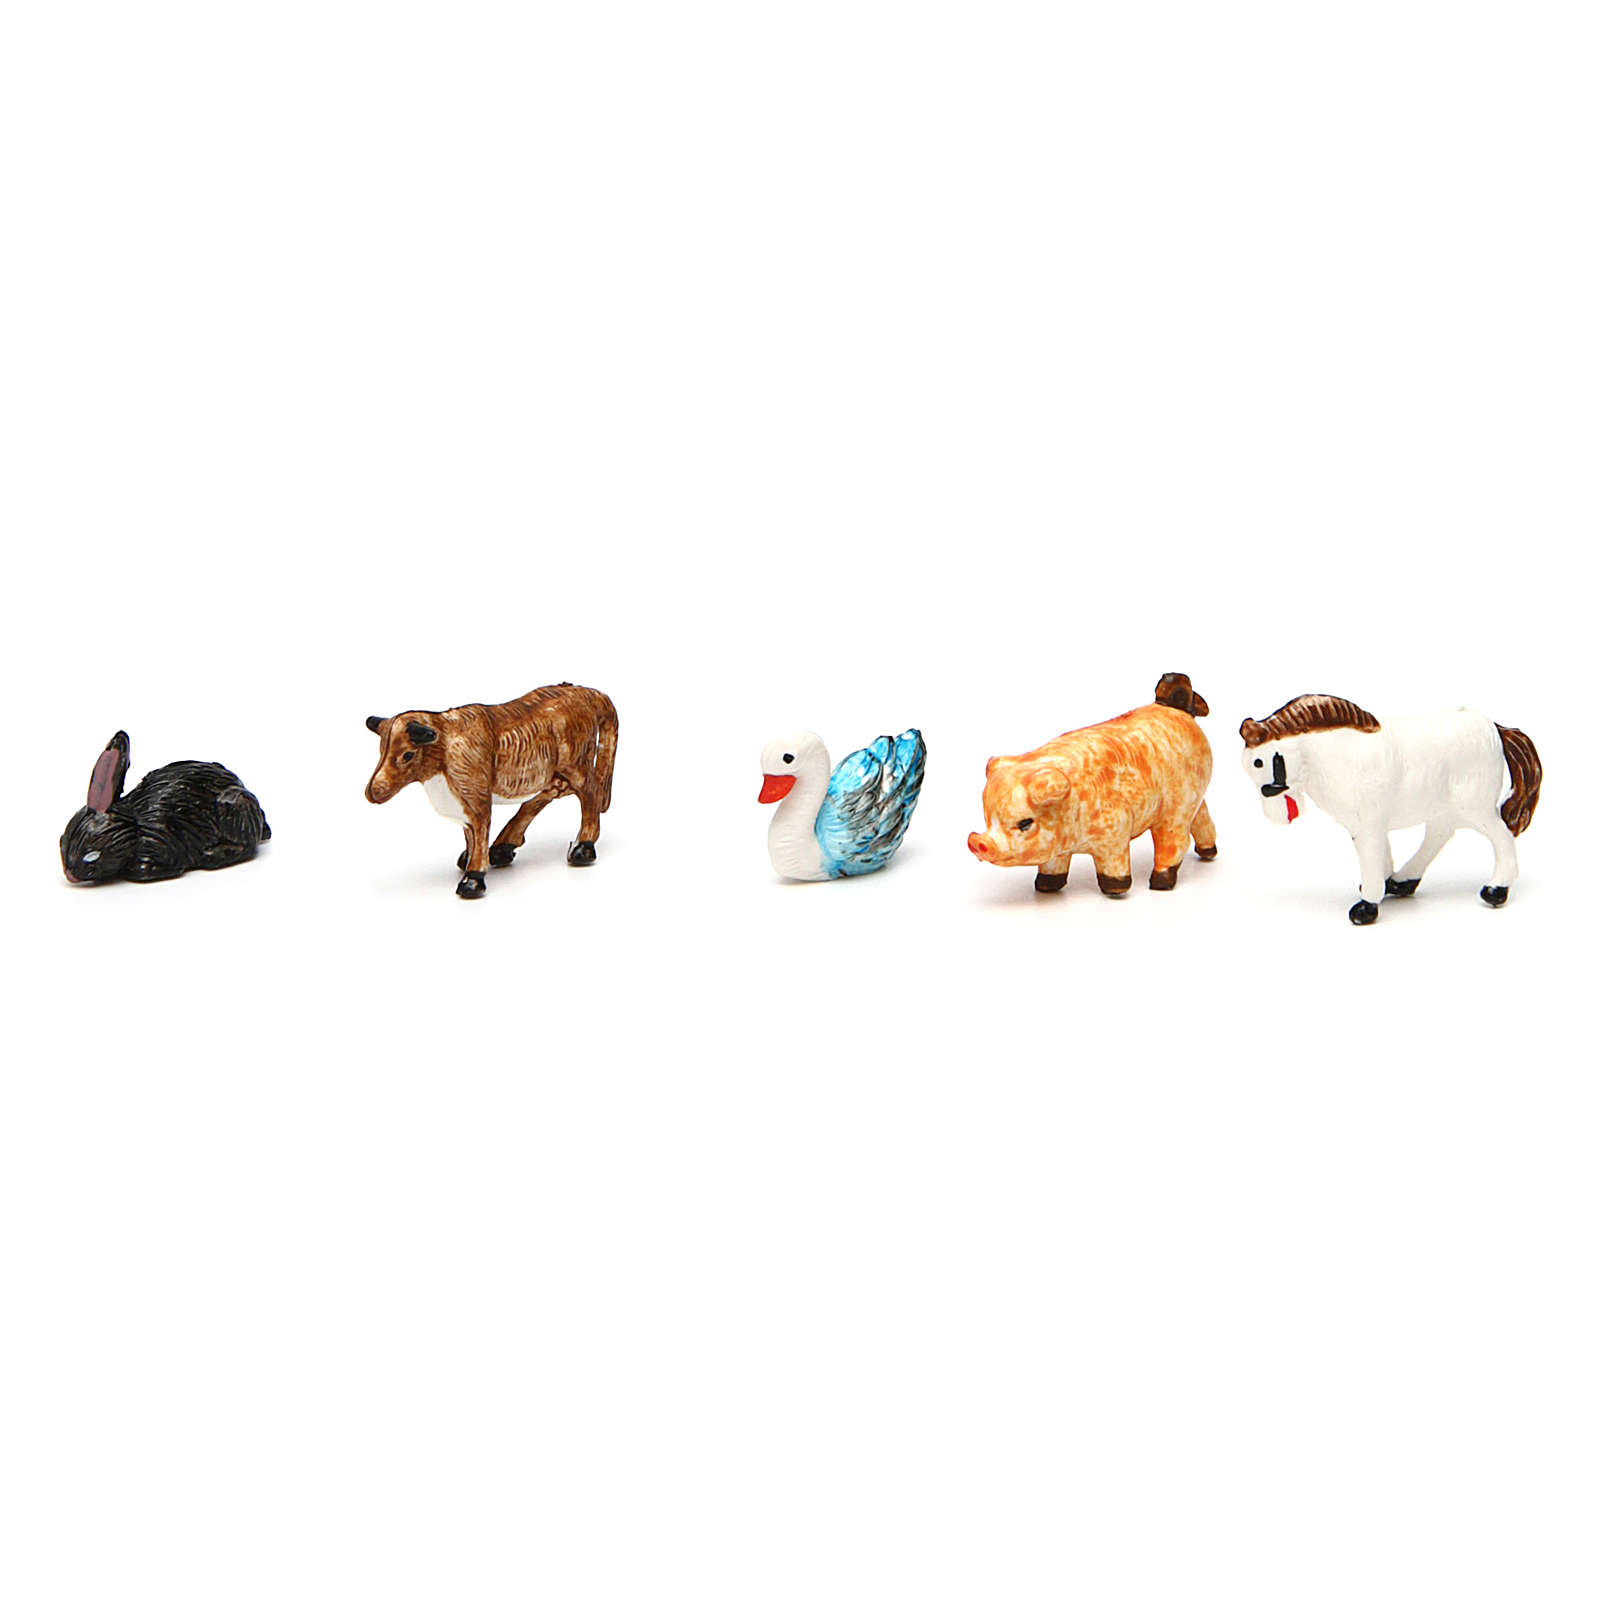 Animales belén 52 piezas belén 3 cm de altura media 3